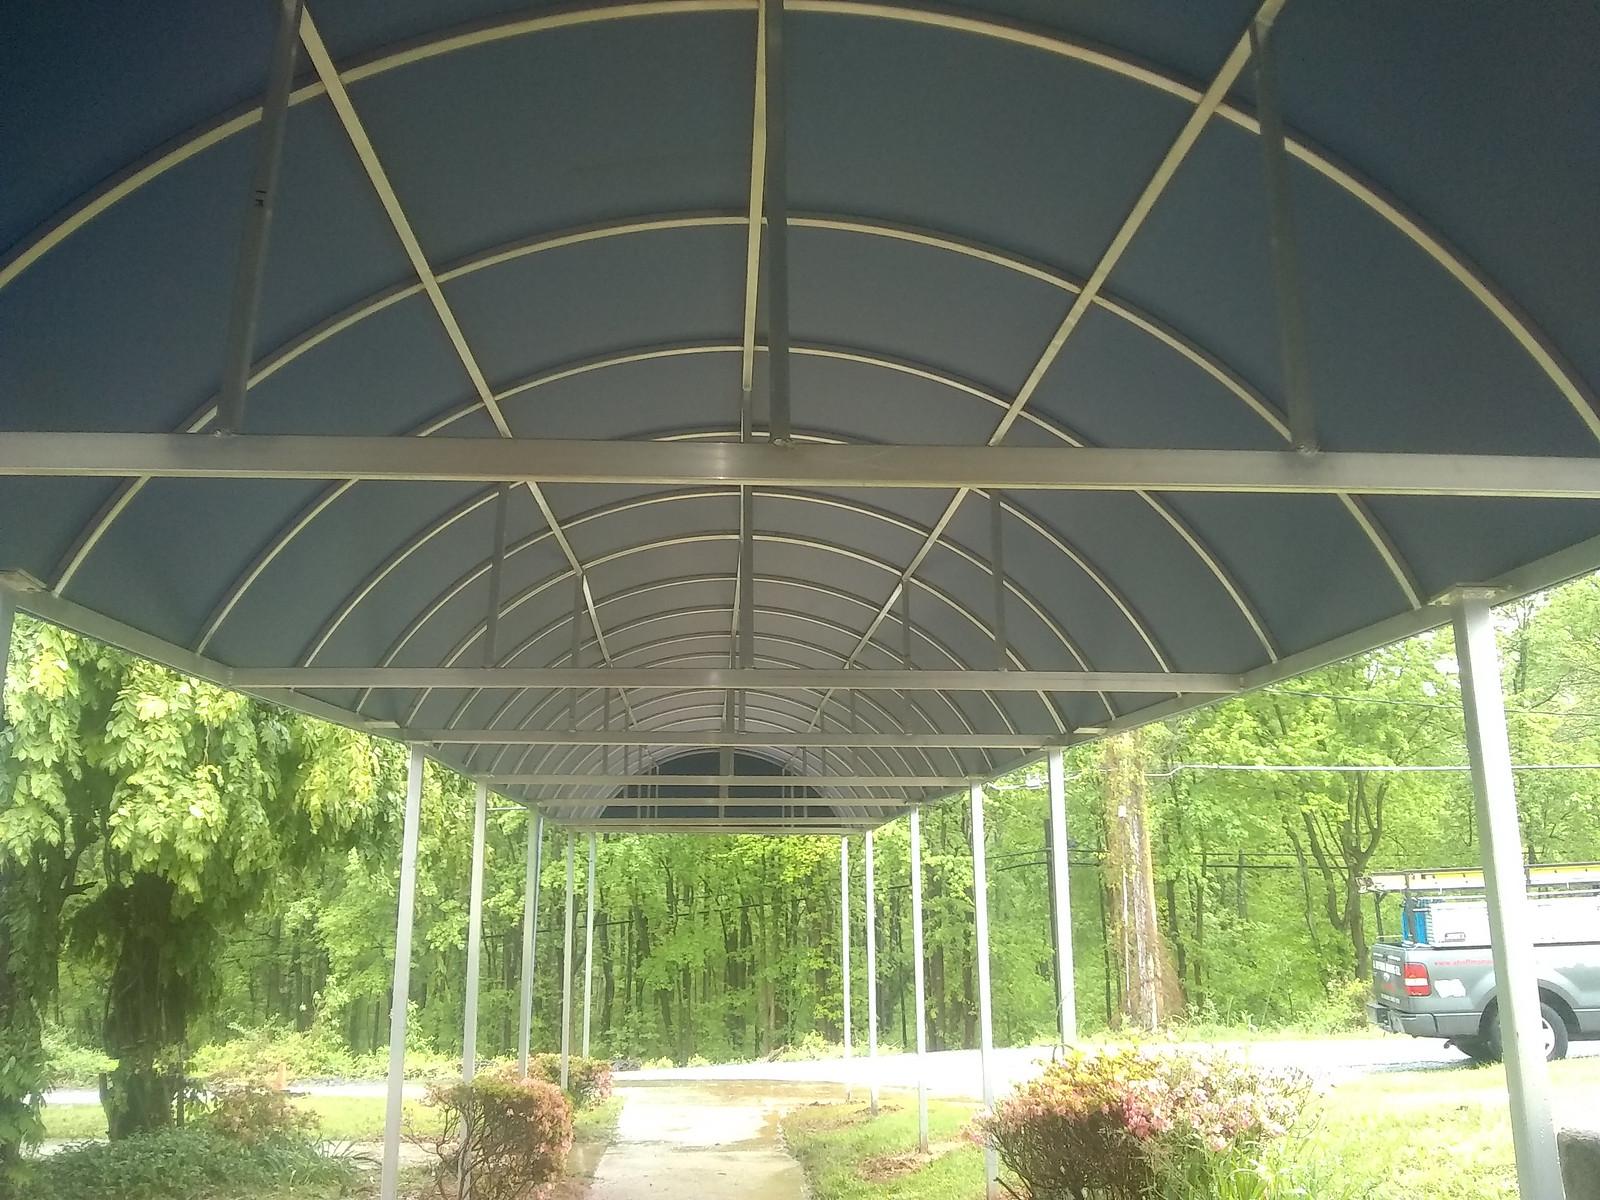 Long Entrance Canopy